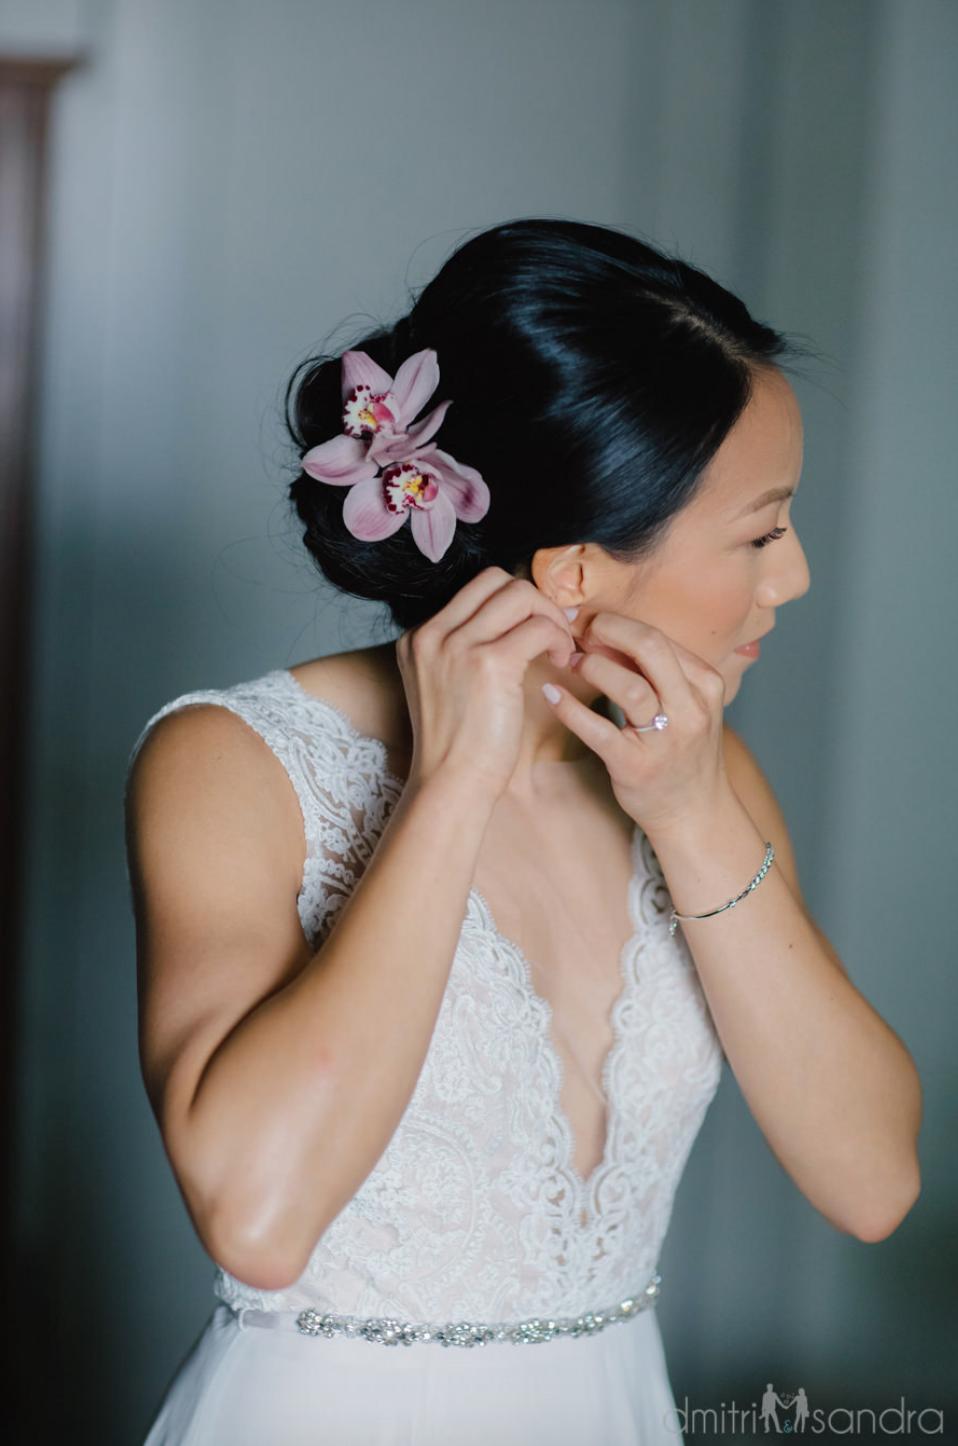 pink cymbidium orchid bridal hair flowers   hair flowers in